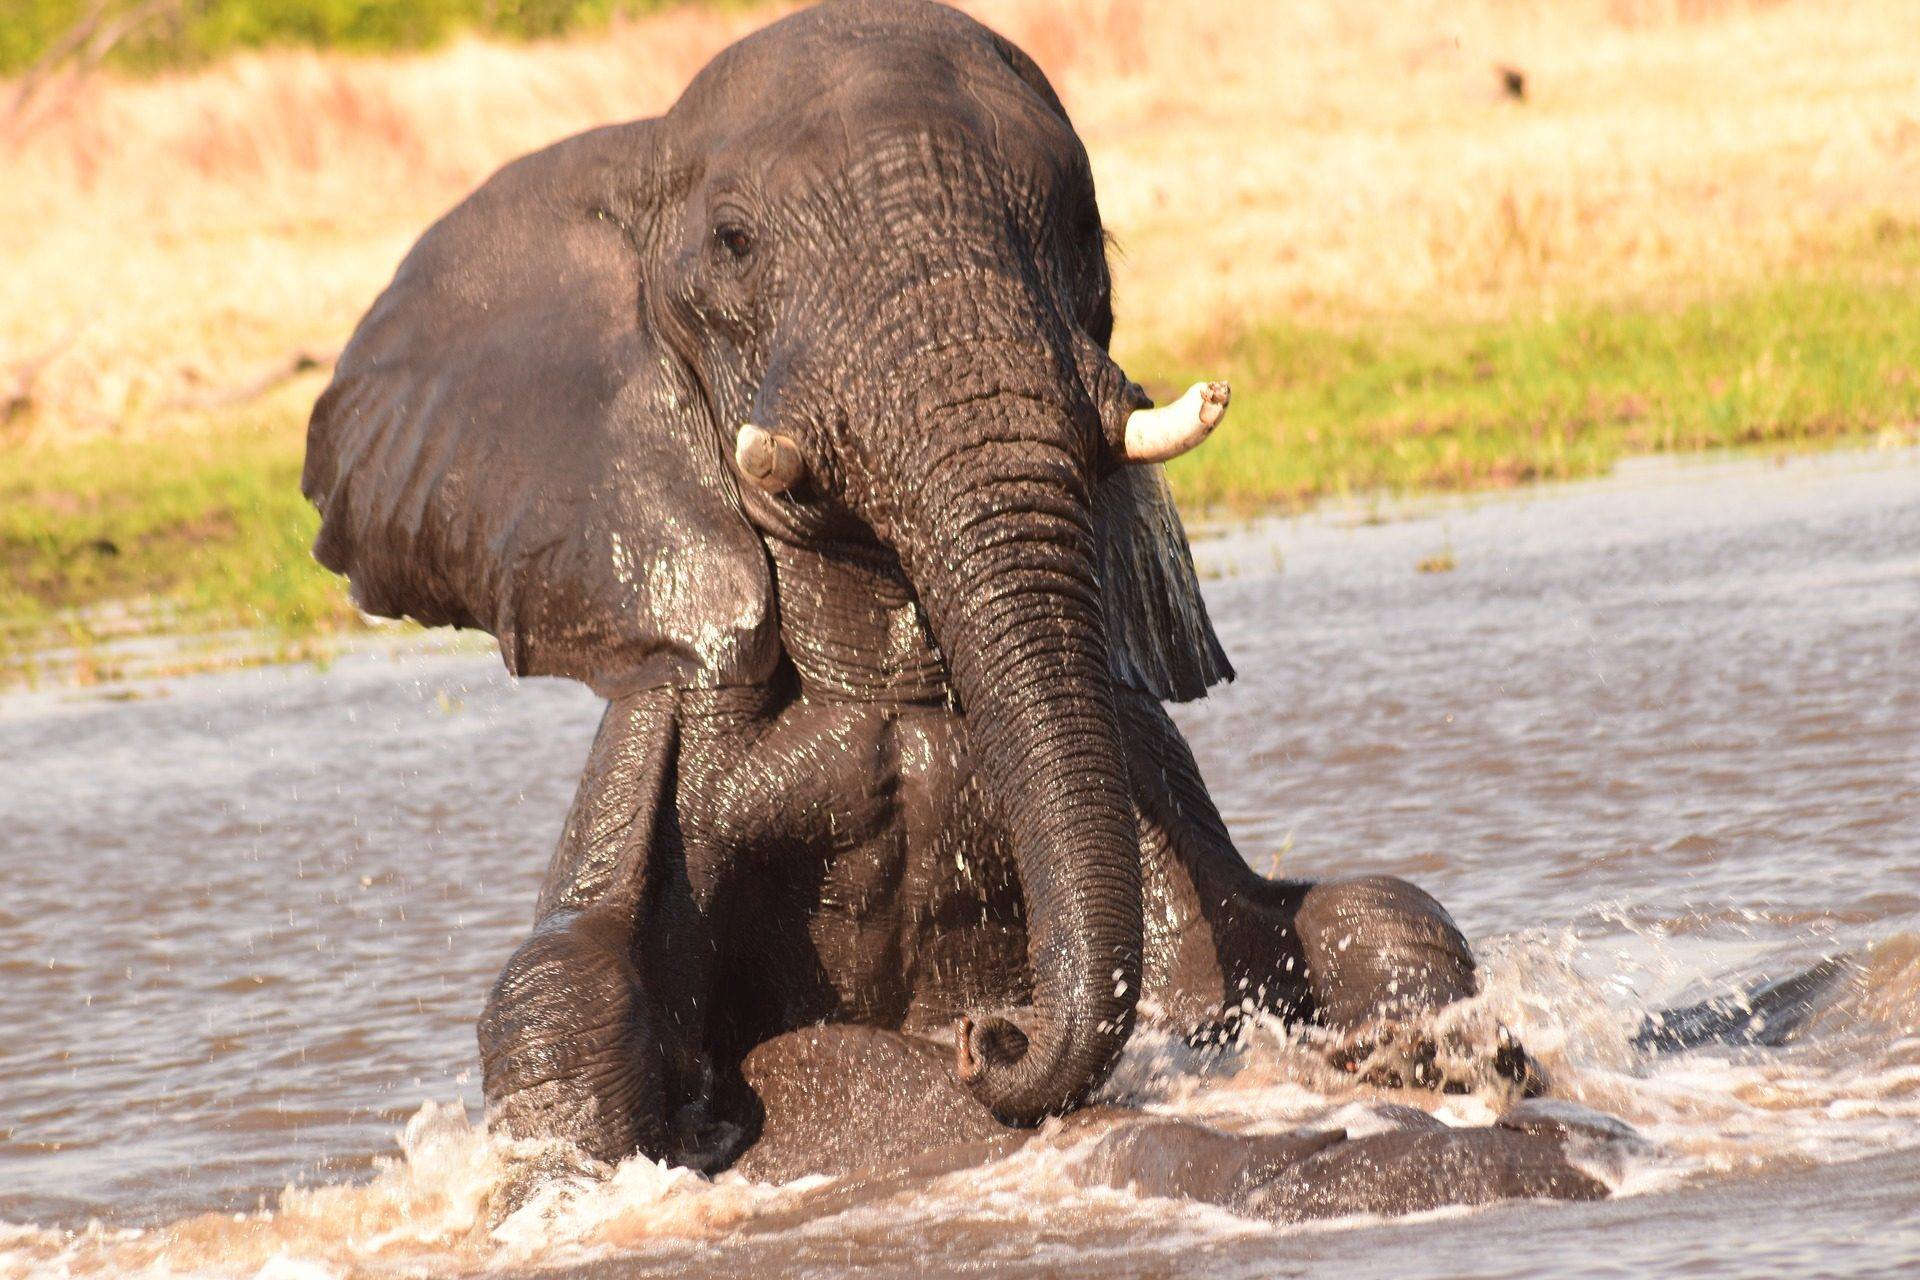 Elefant, Río, Wasser, Spiel, Bad, Reißzähne - Wallpaper HD - Prof.-falken.com